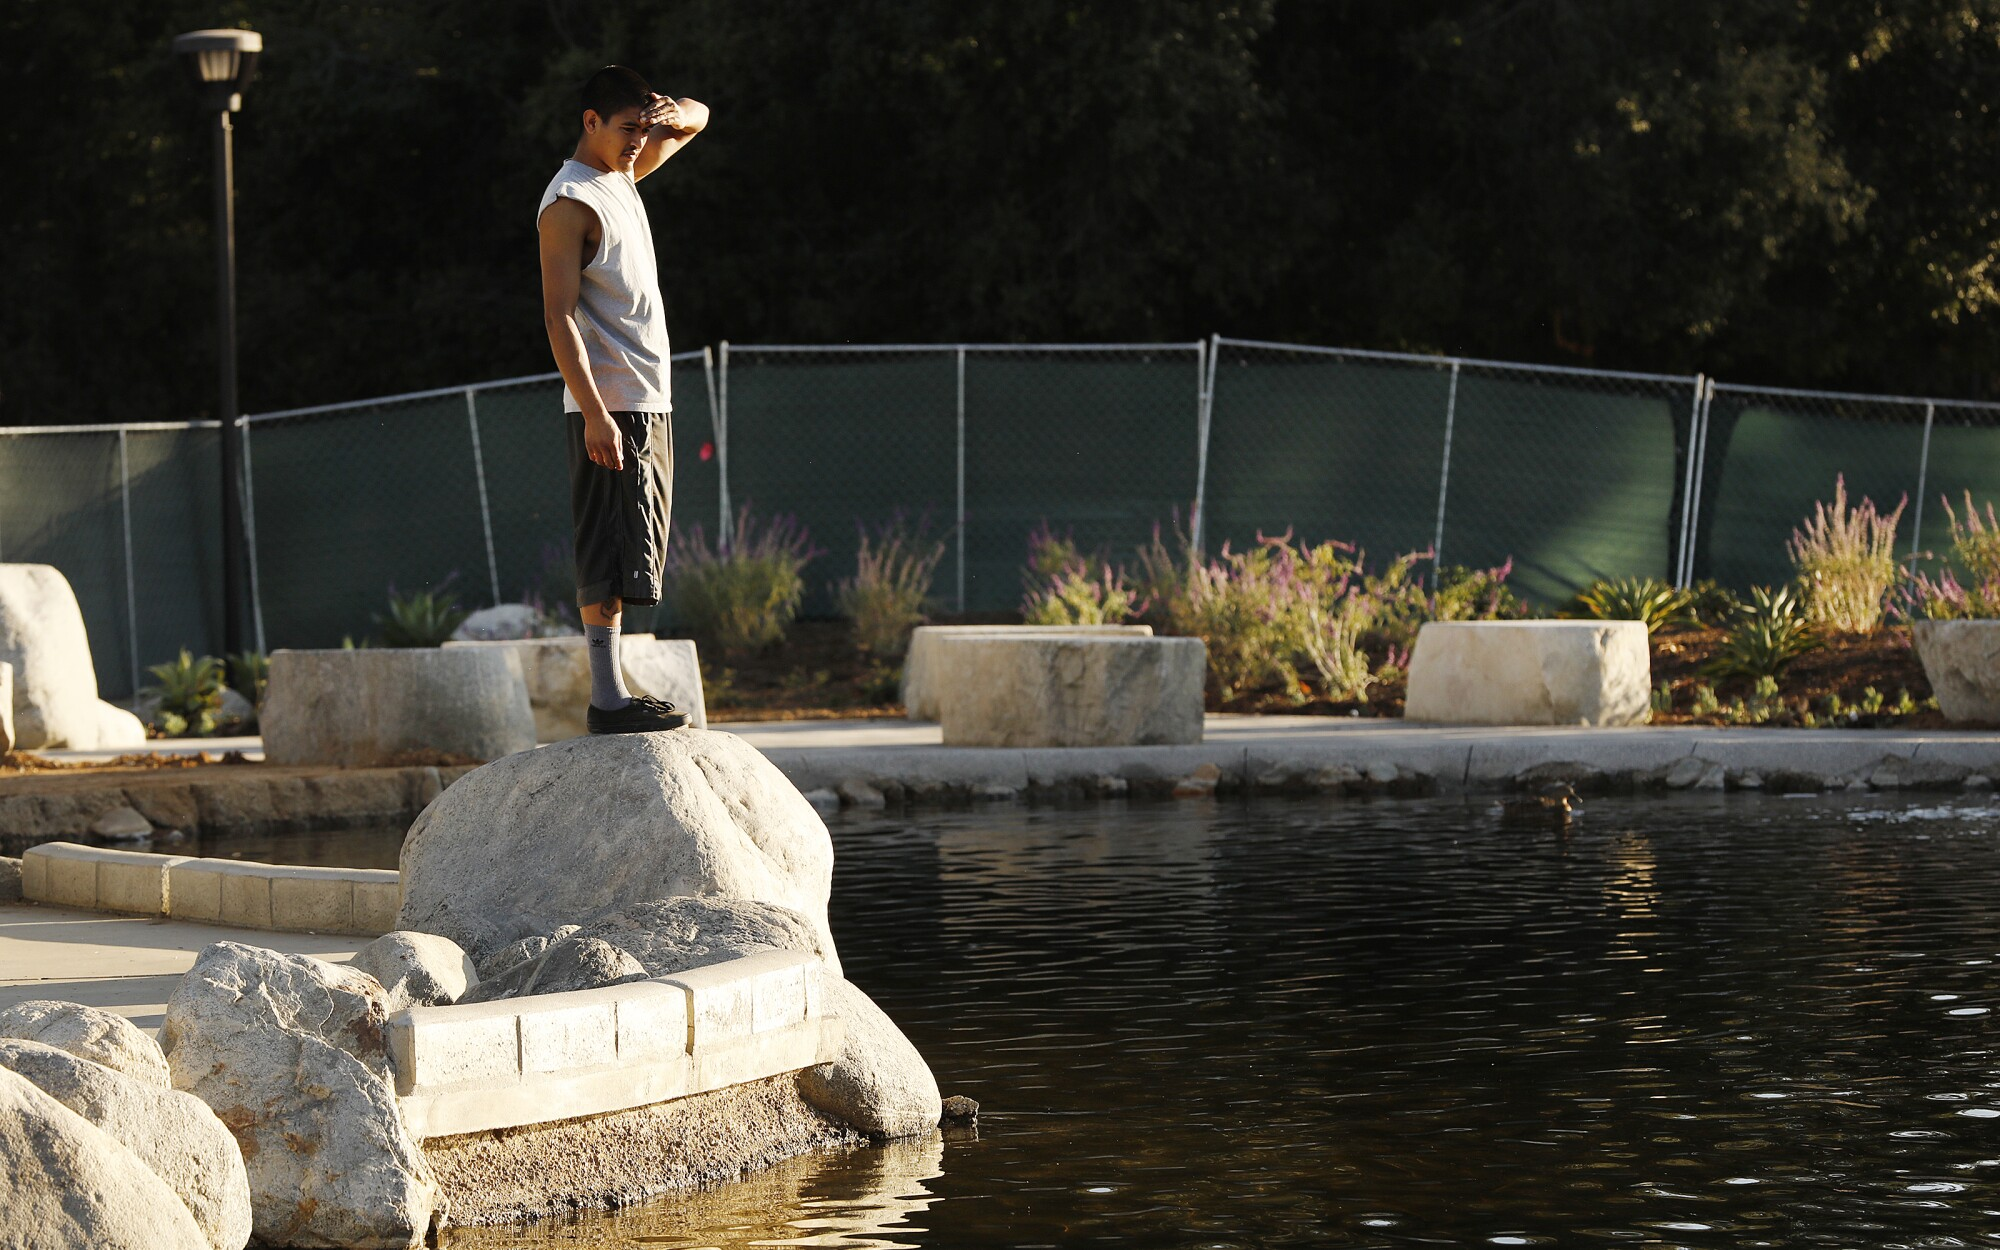 Juan Sarai looks at the Healing Garden at Conejo Creek North Park